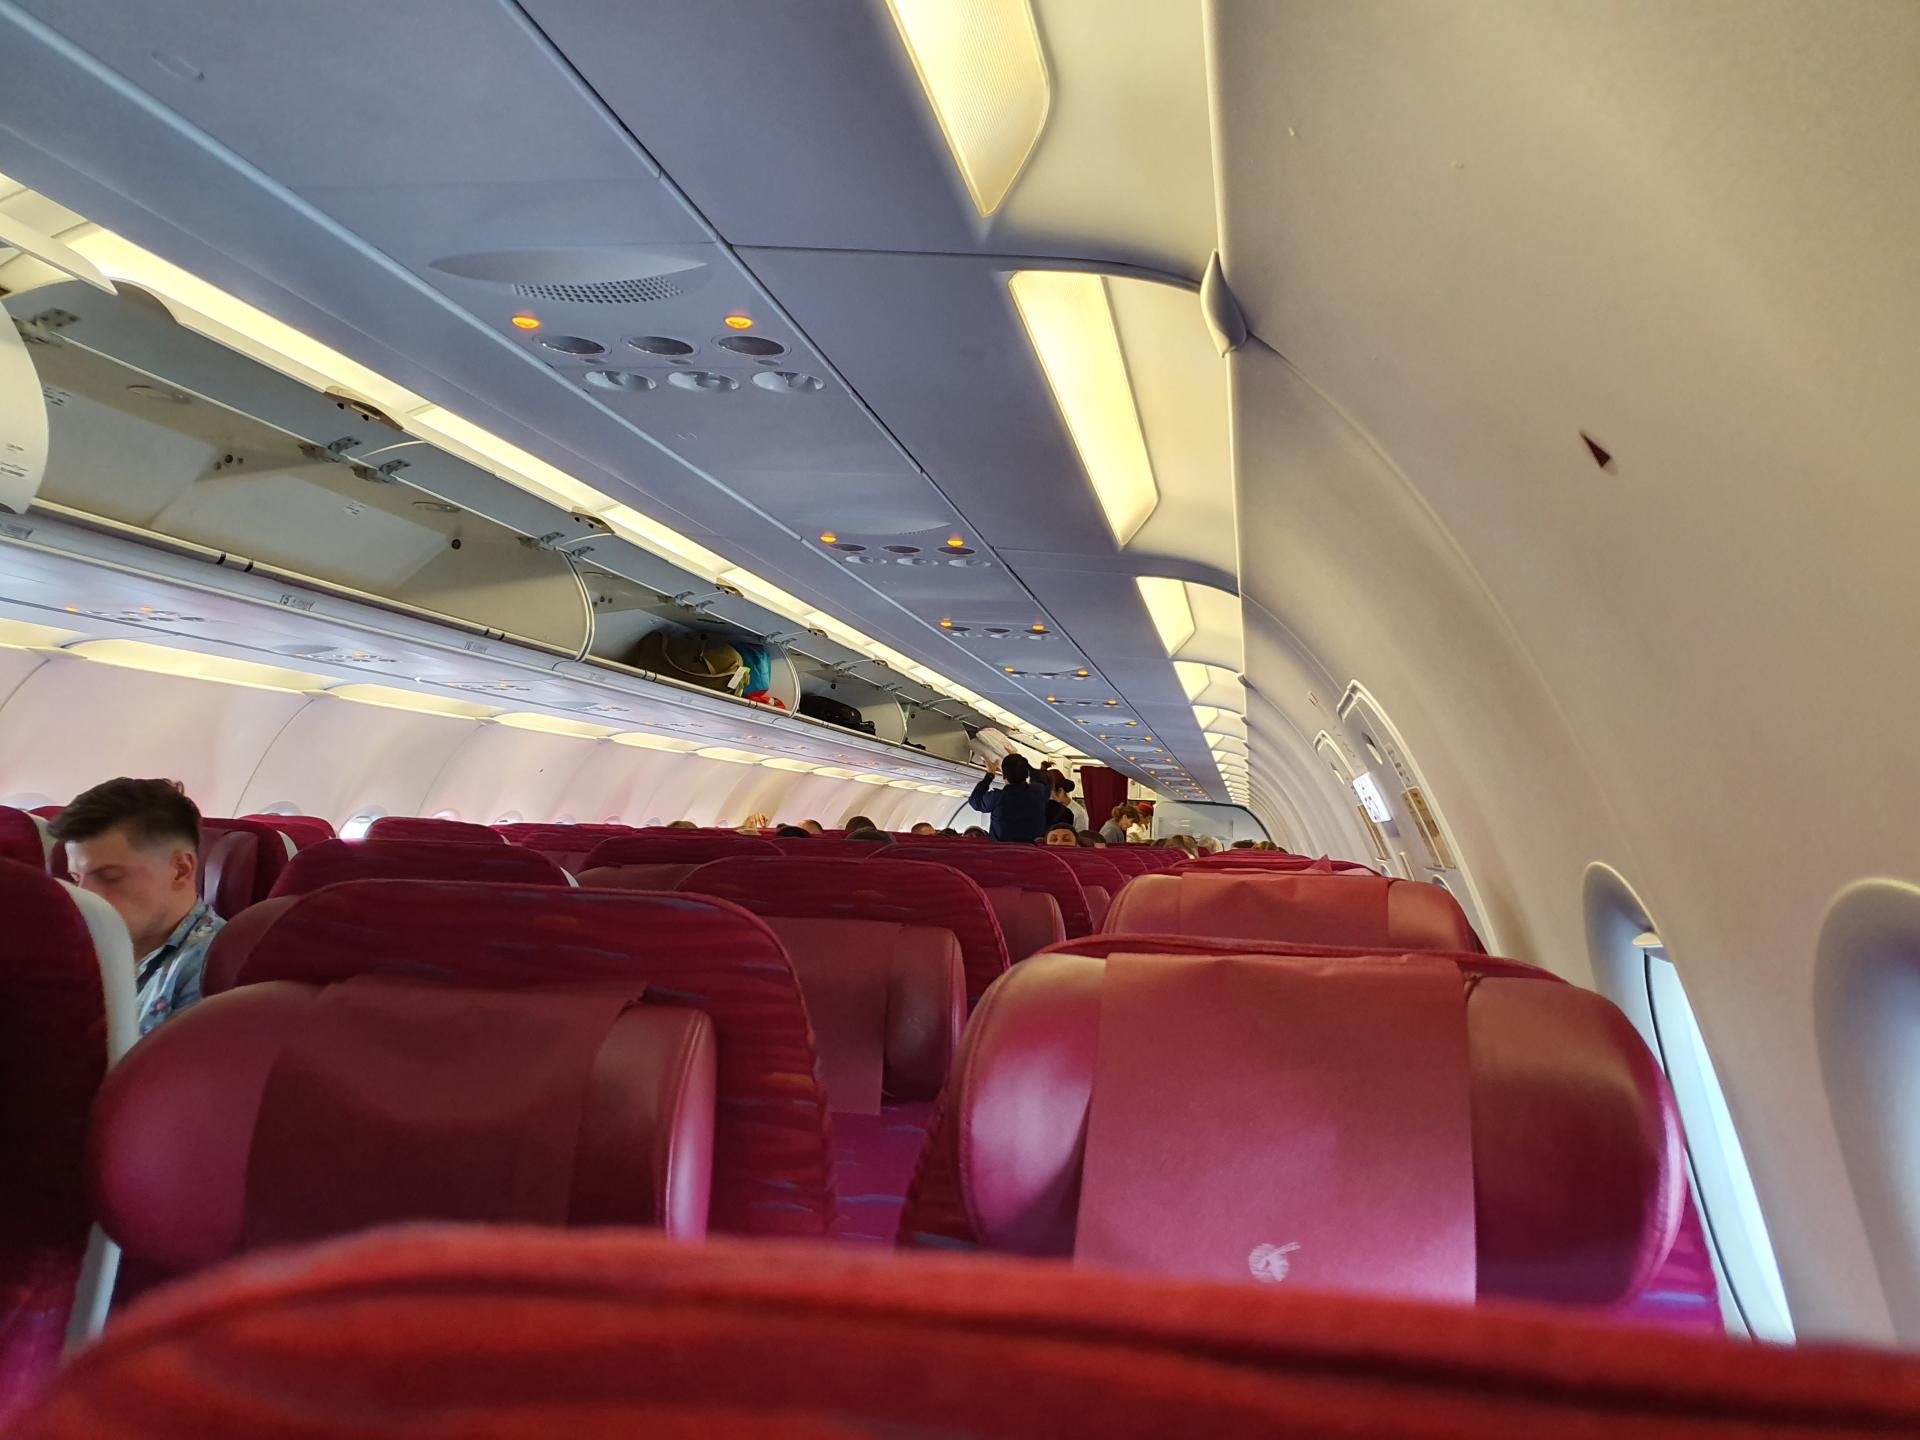 интерьер салона самолета у авиакомпании Qatar